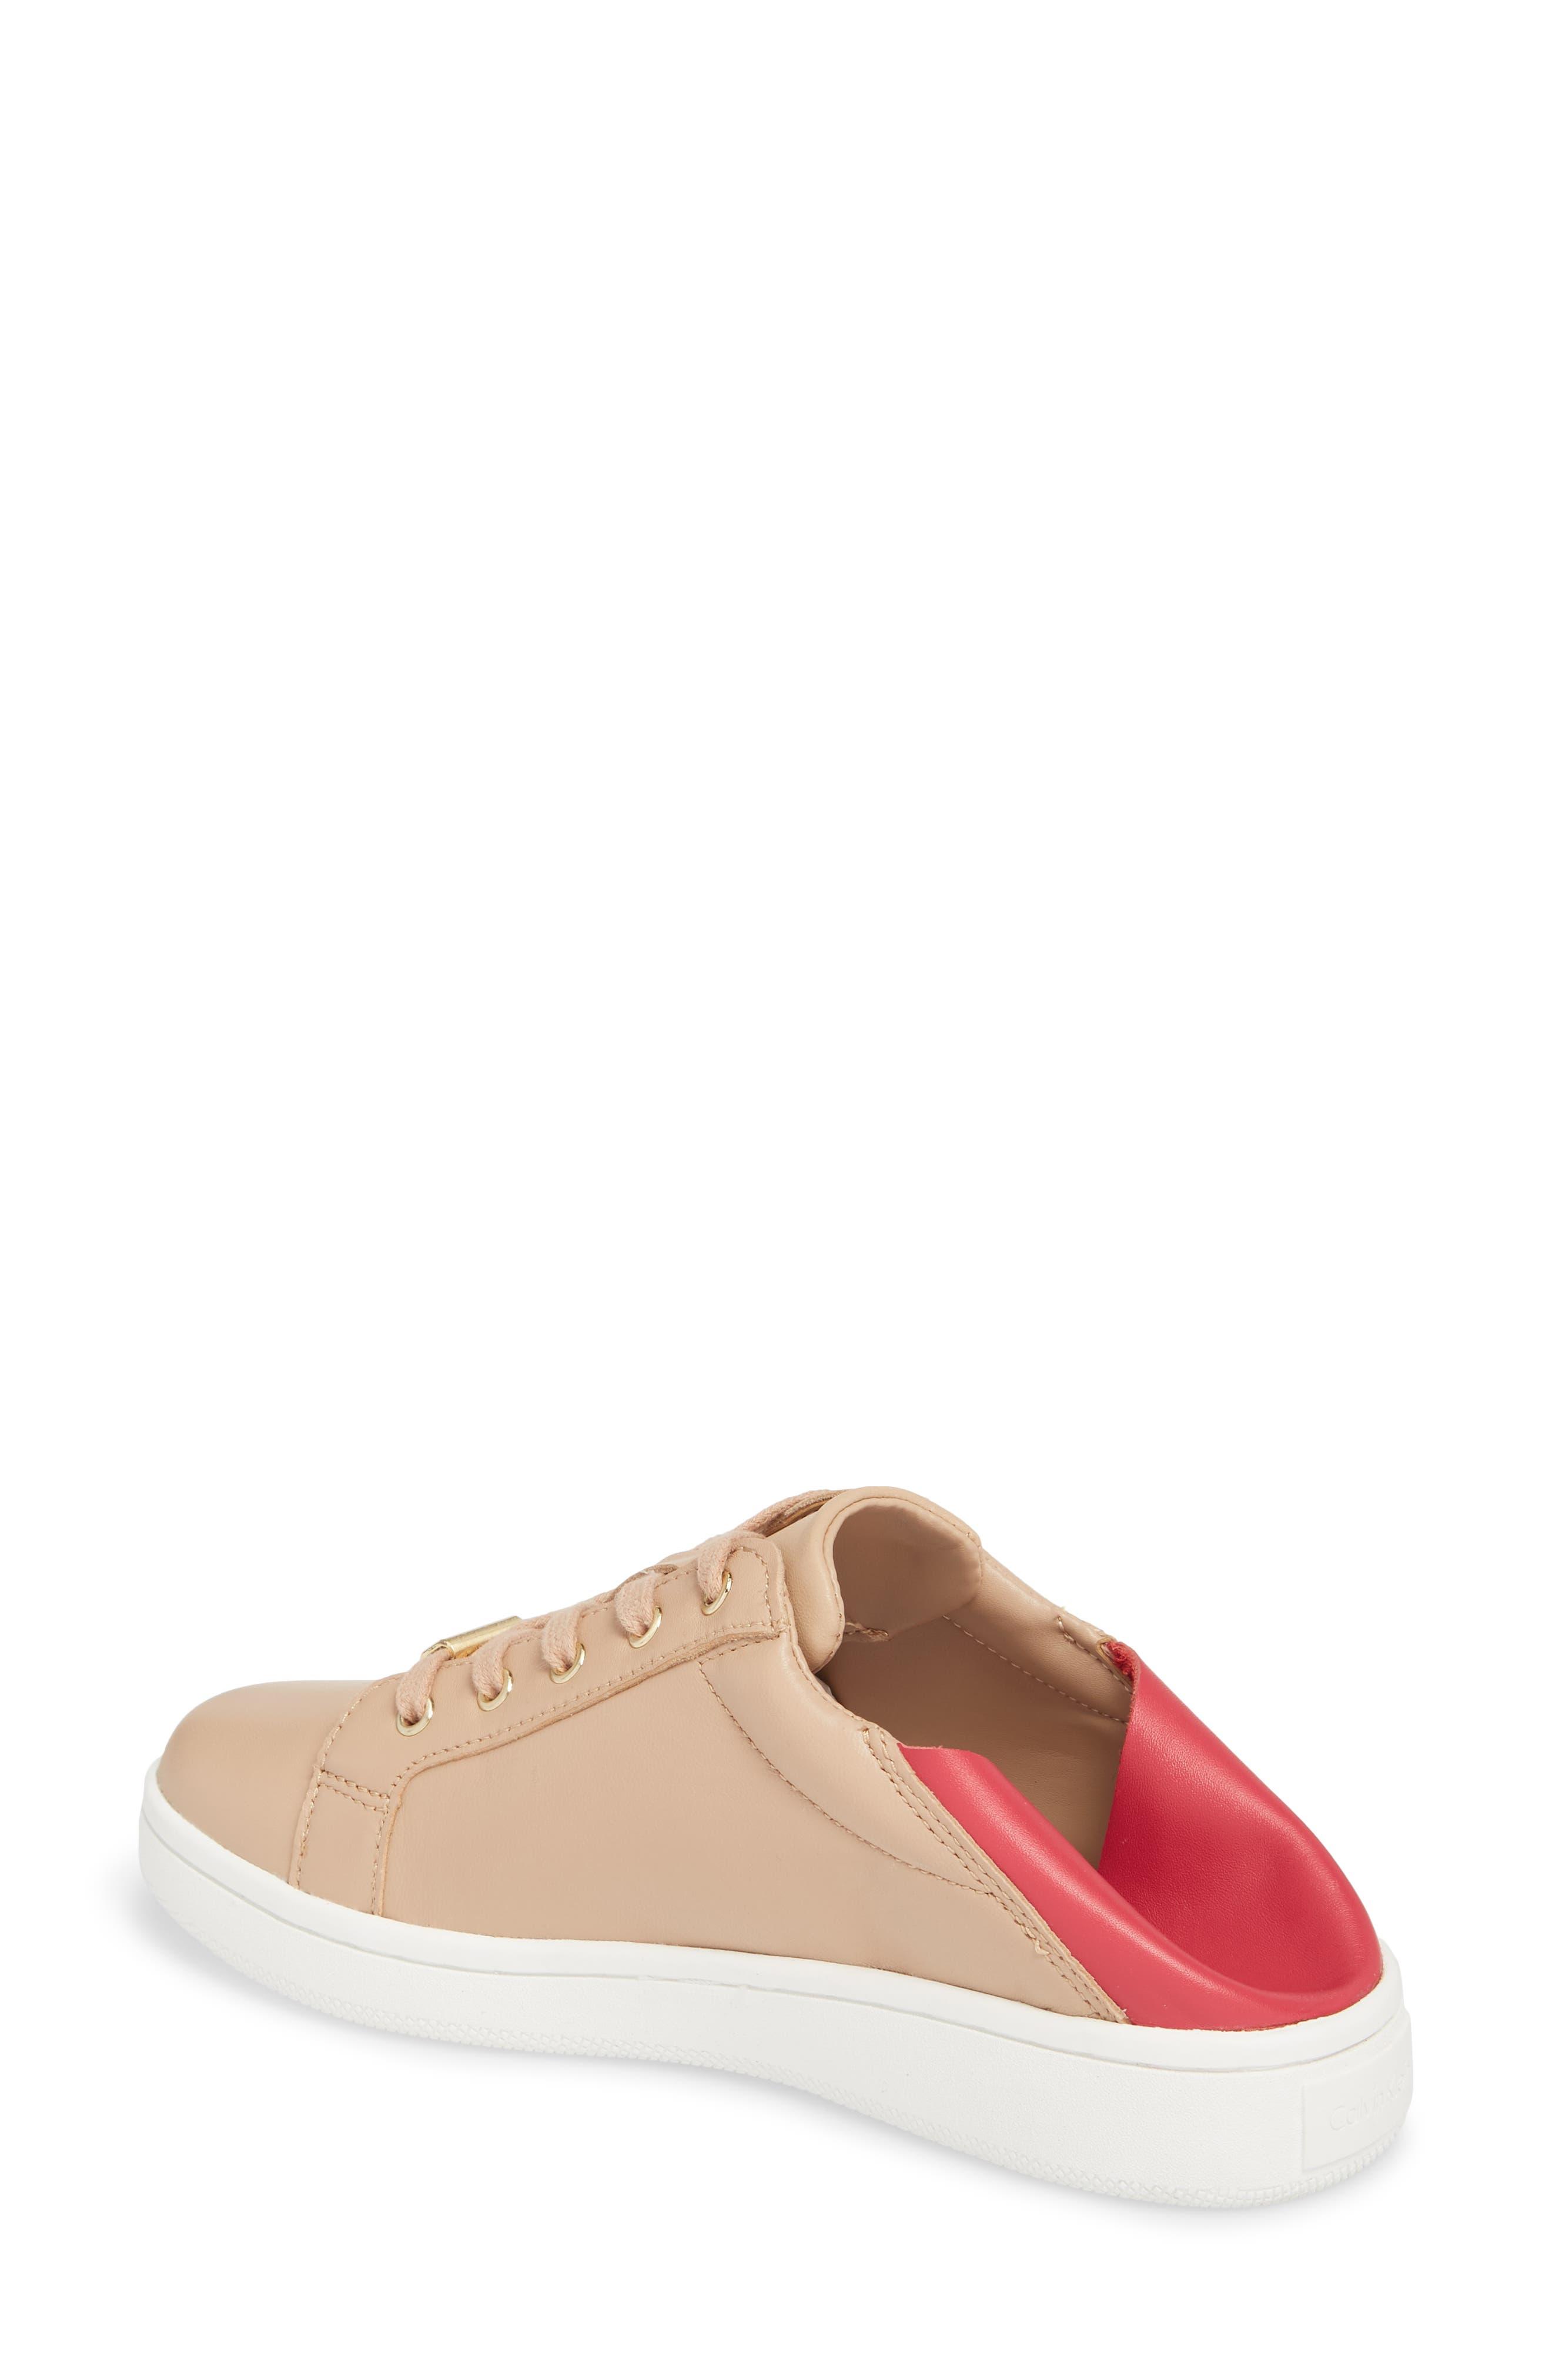 Danica Convertible Sneaker,                             Alternate thumbnail 2, color,                             Desert Sand Leather